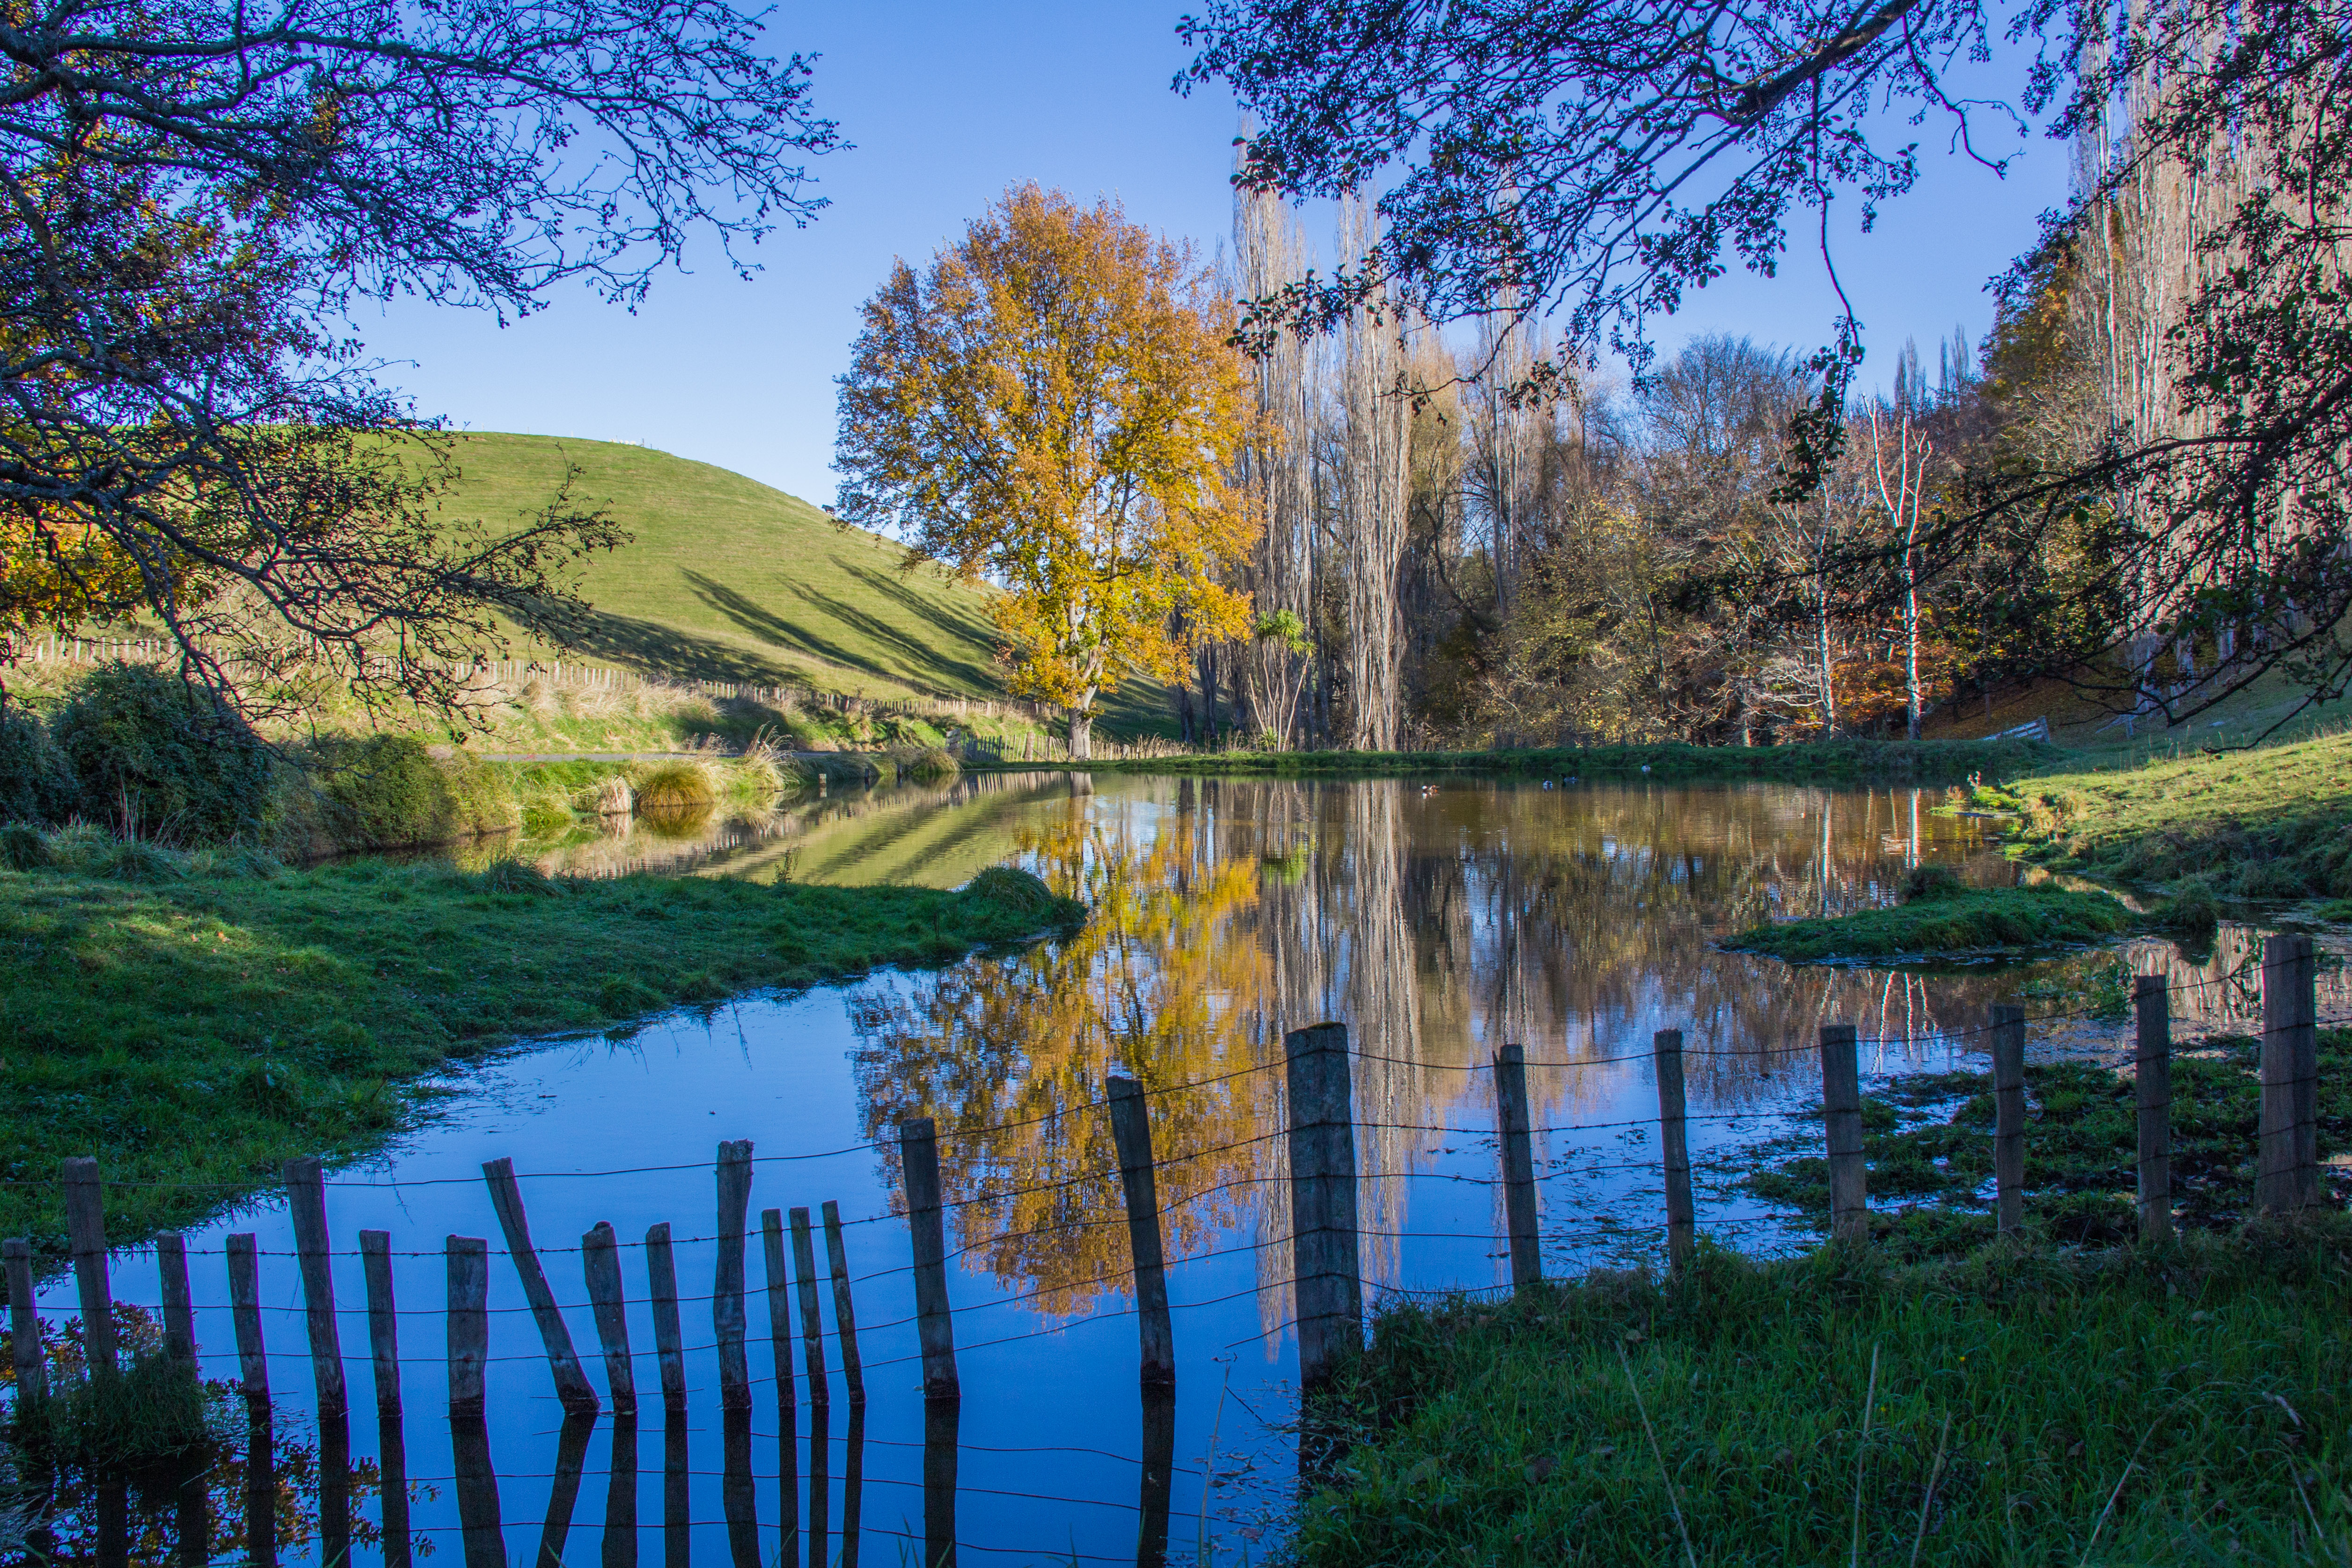 Autumn reflective pond